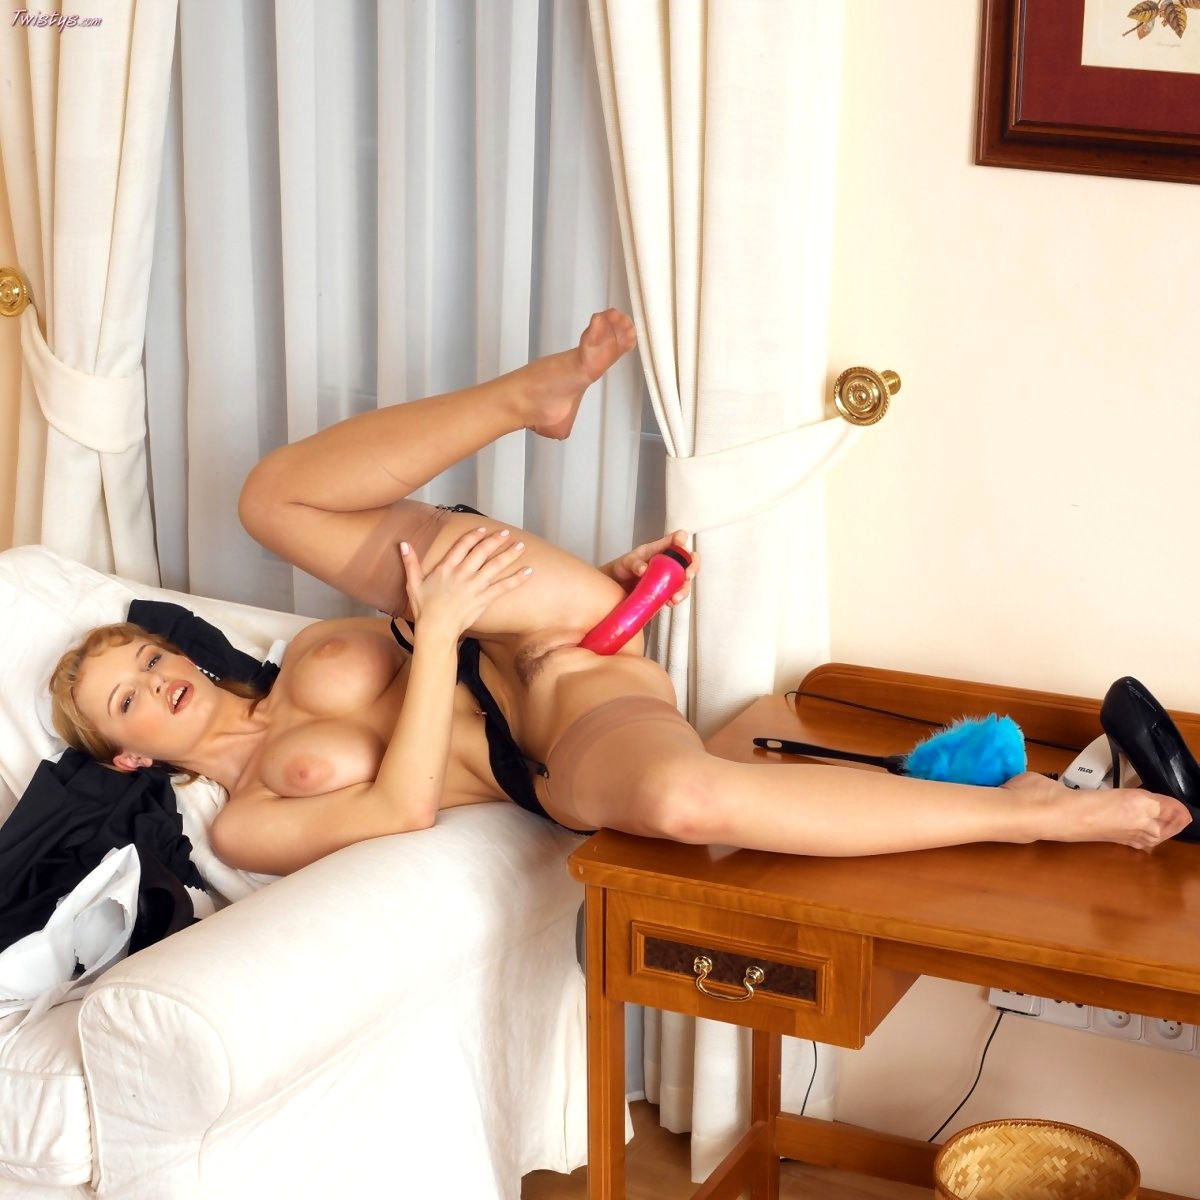 Bobbi starr maid - 2 part 9